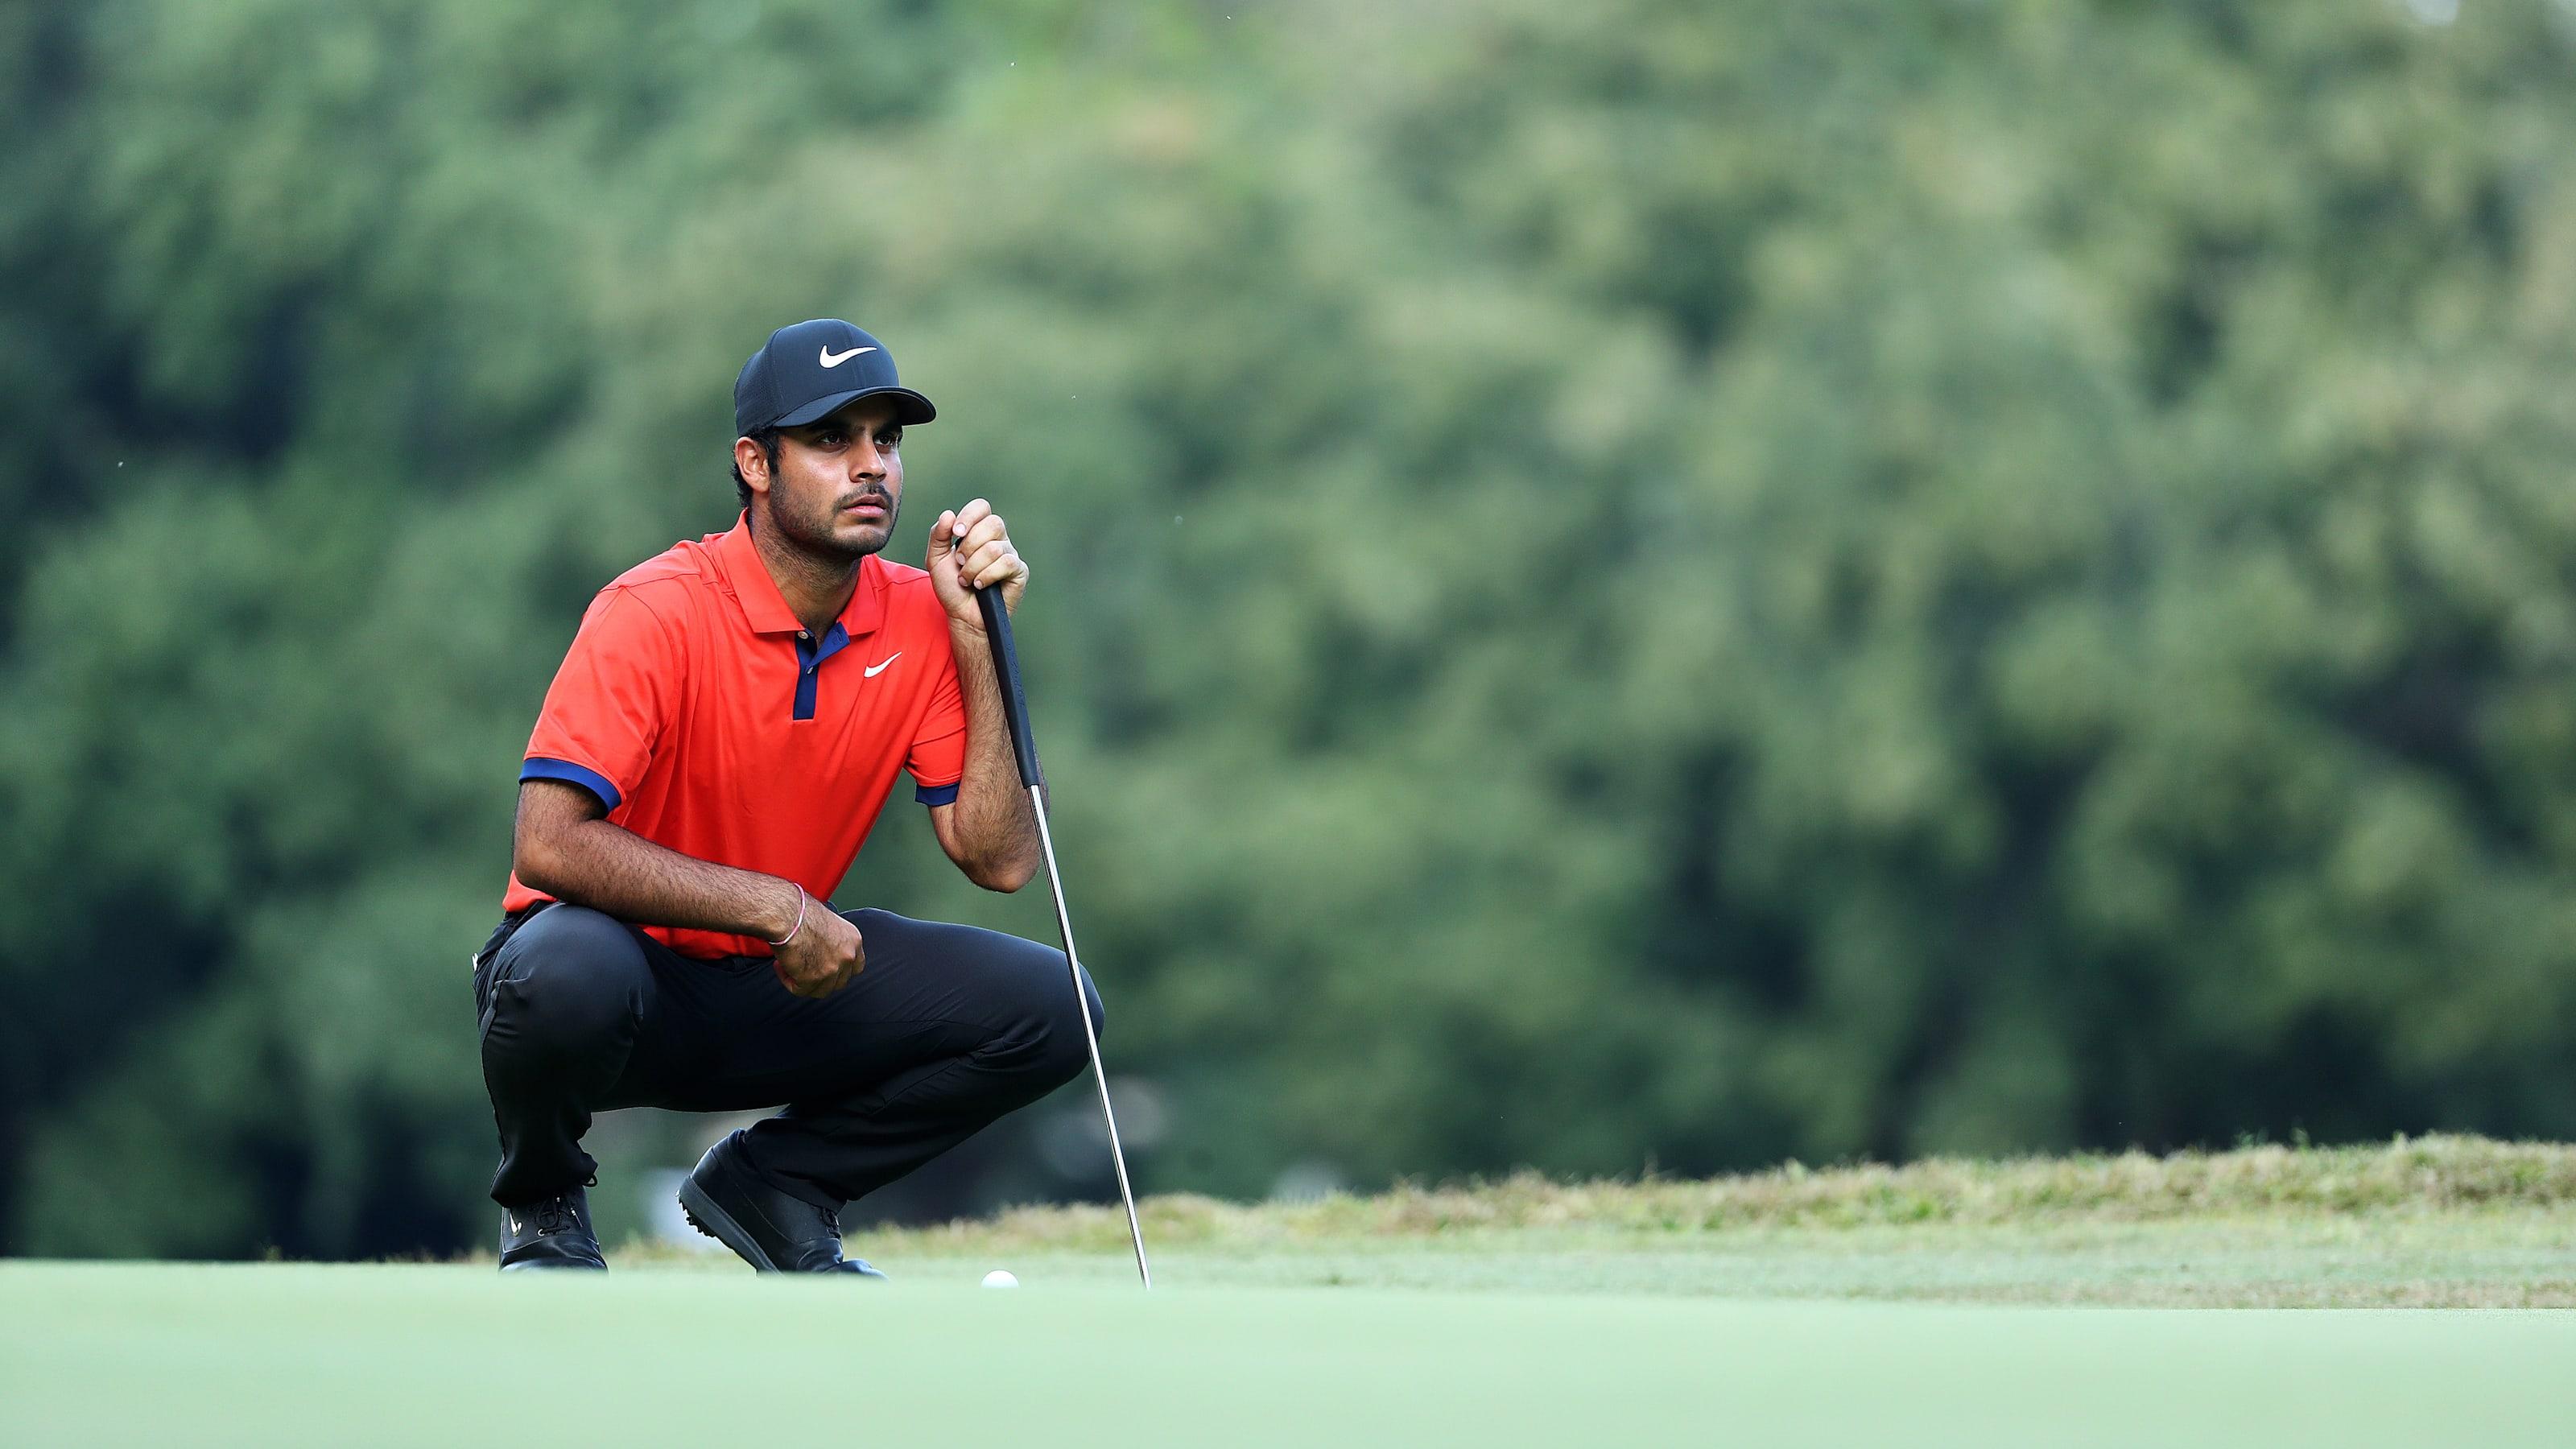 Indian golfer Shubhankar Sharma ups his game during lockdown